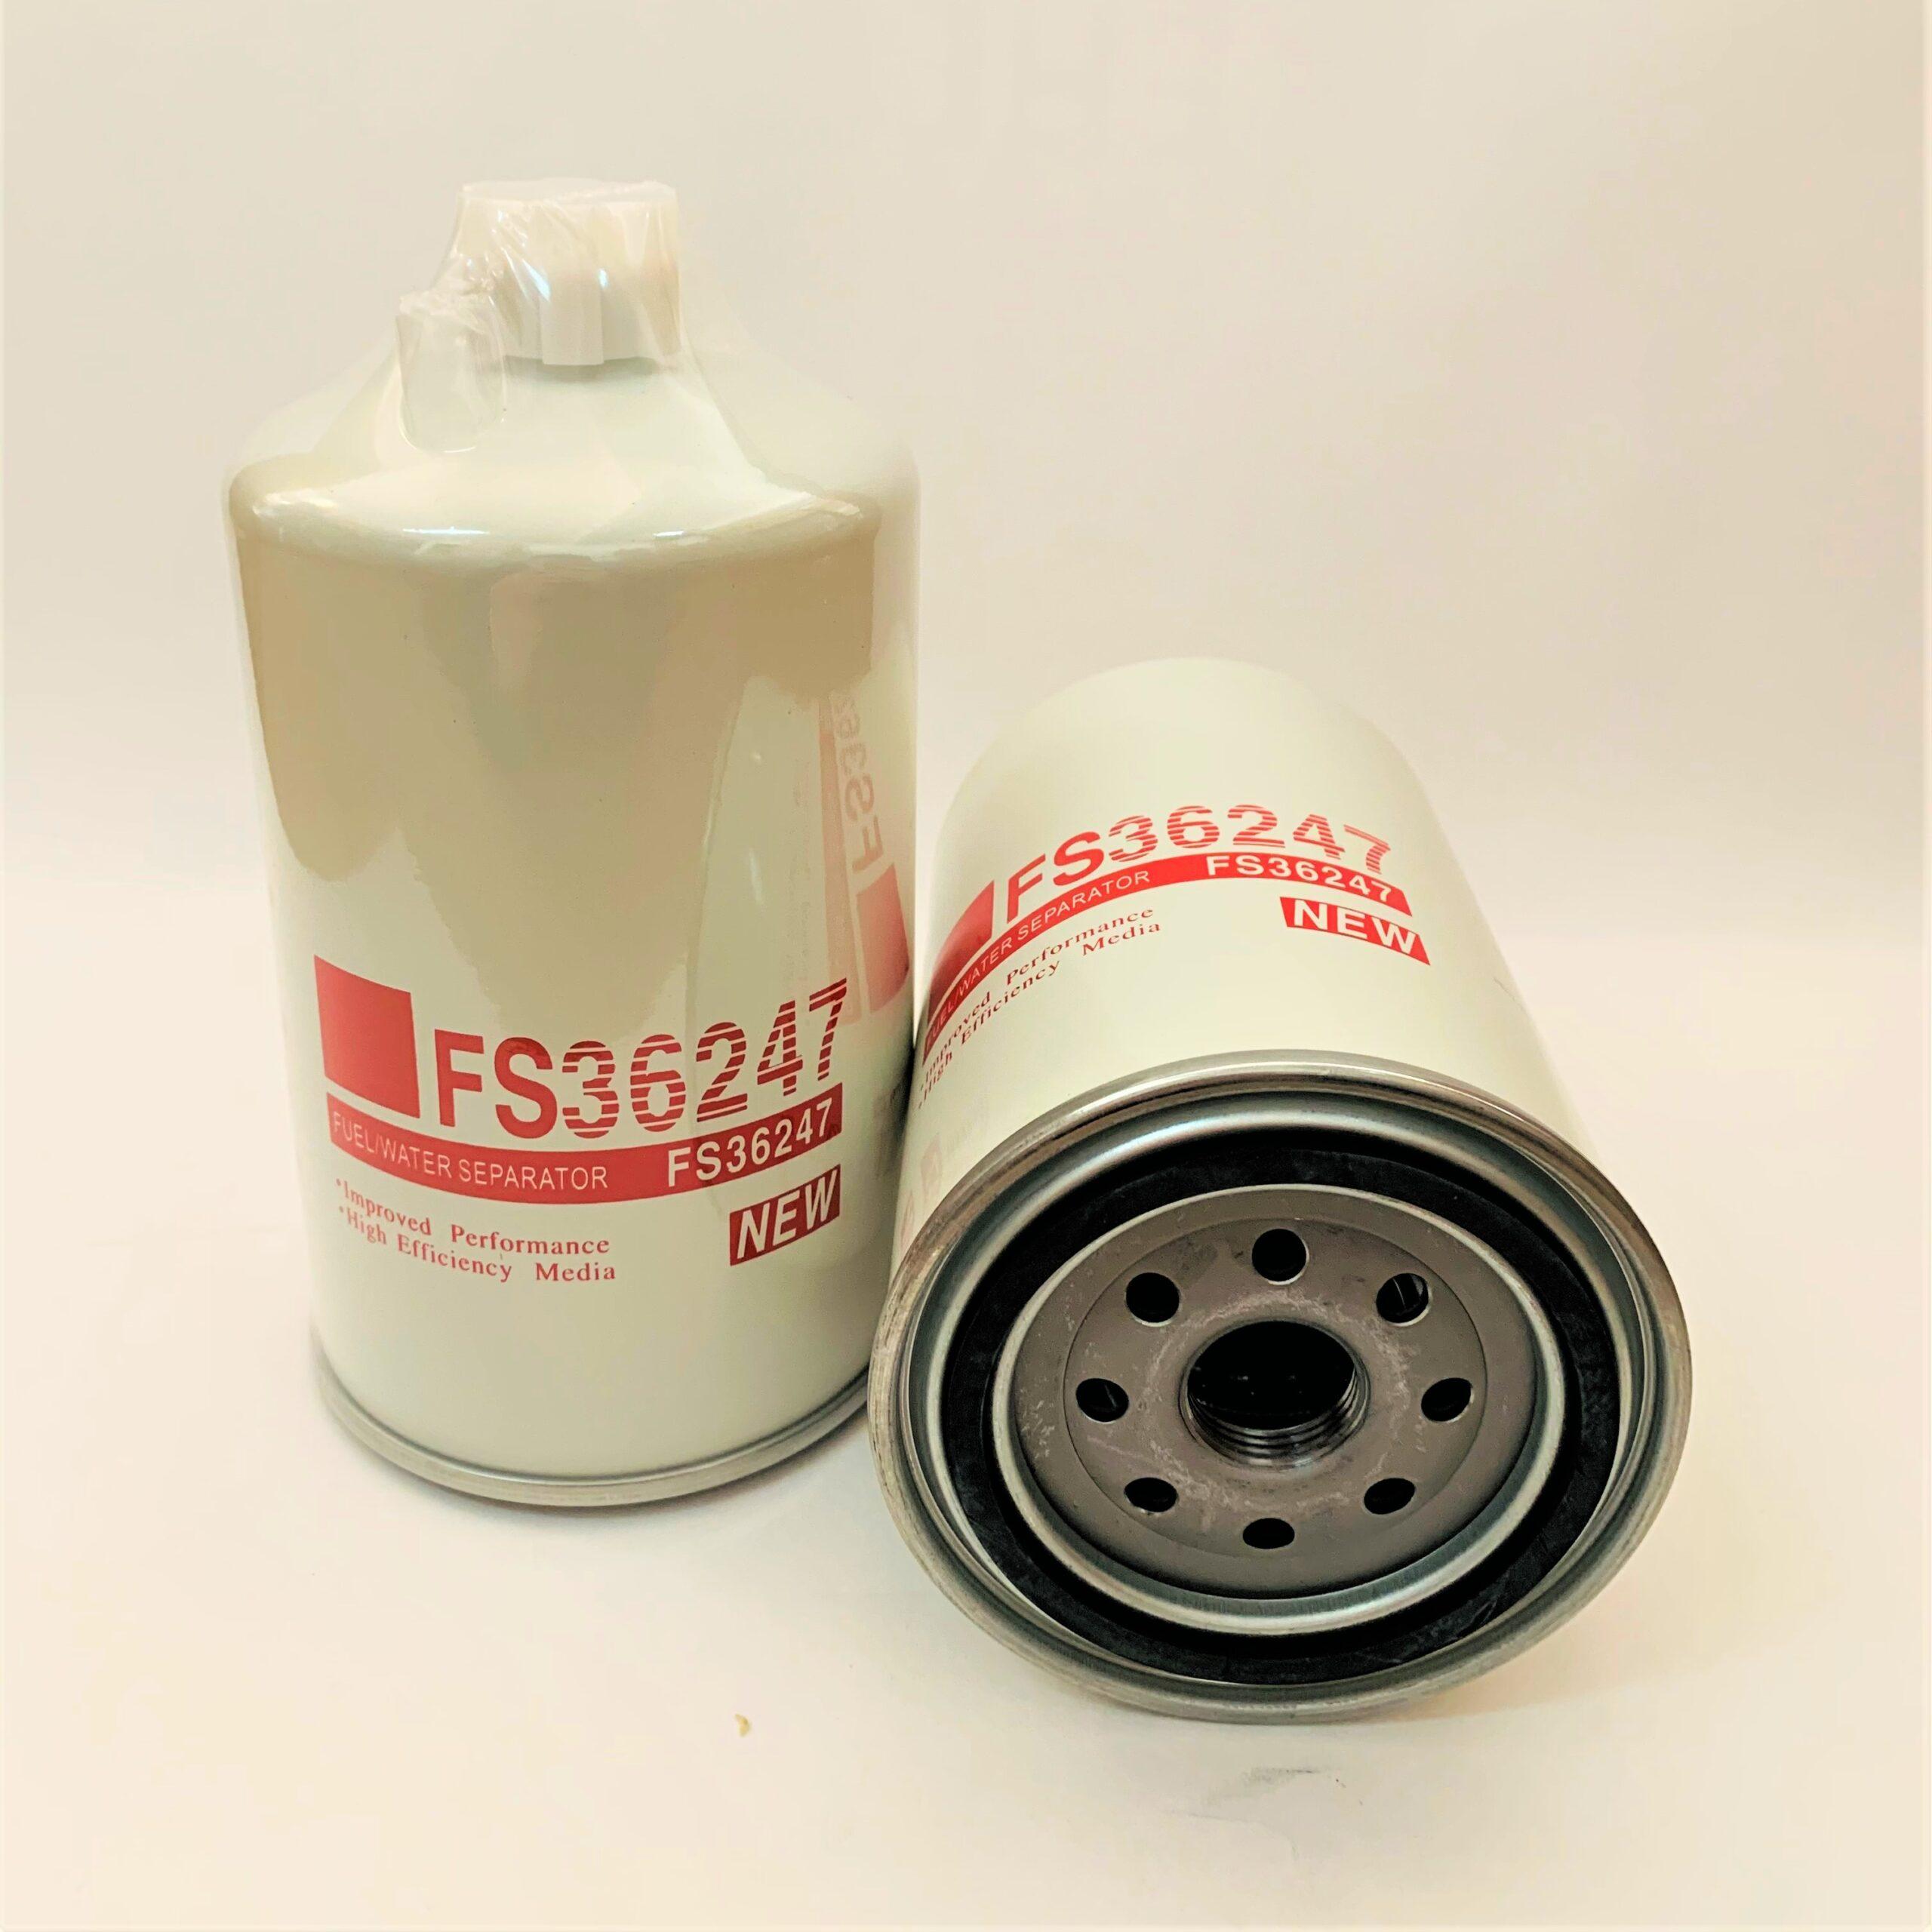 FS36247